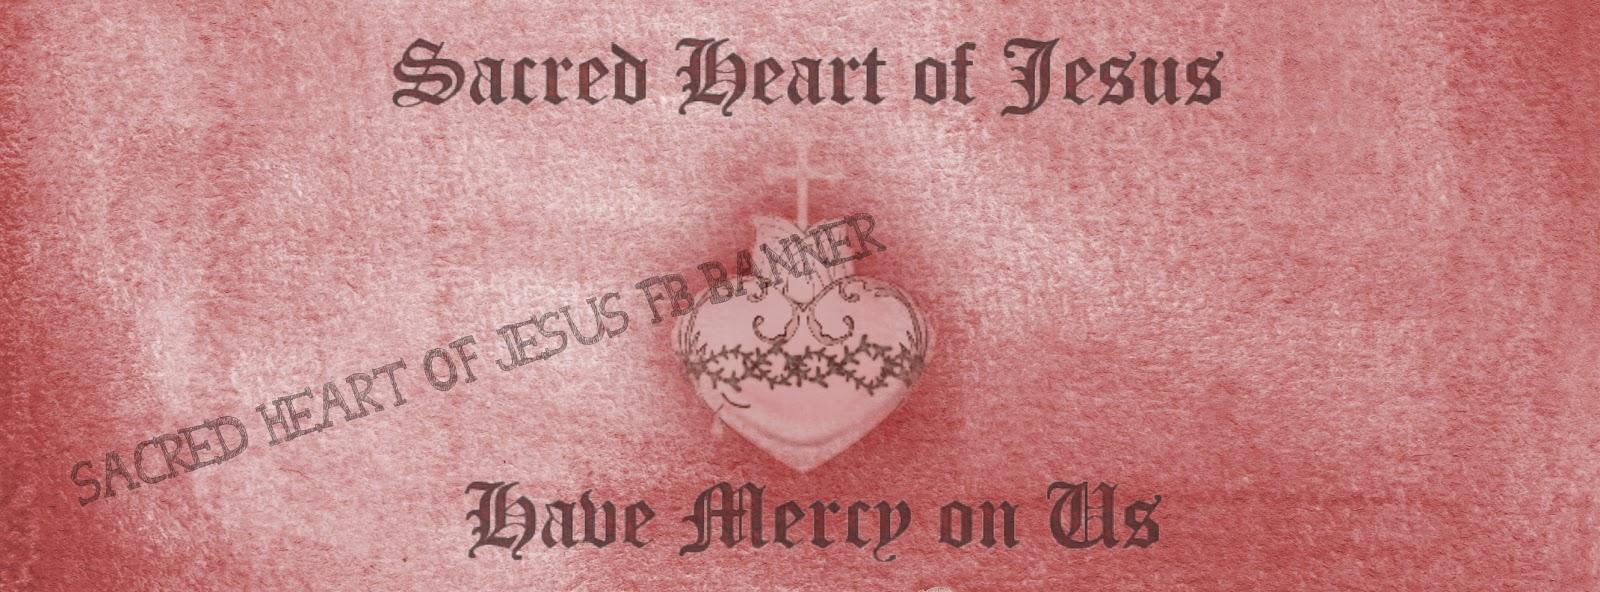 Life, Love, & Sacred Art: Sharing your Faith through Facebook Banners